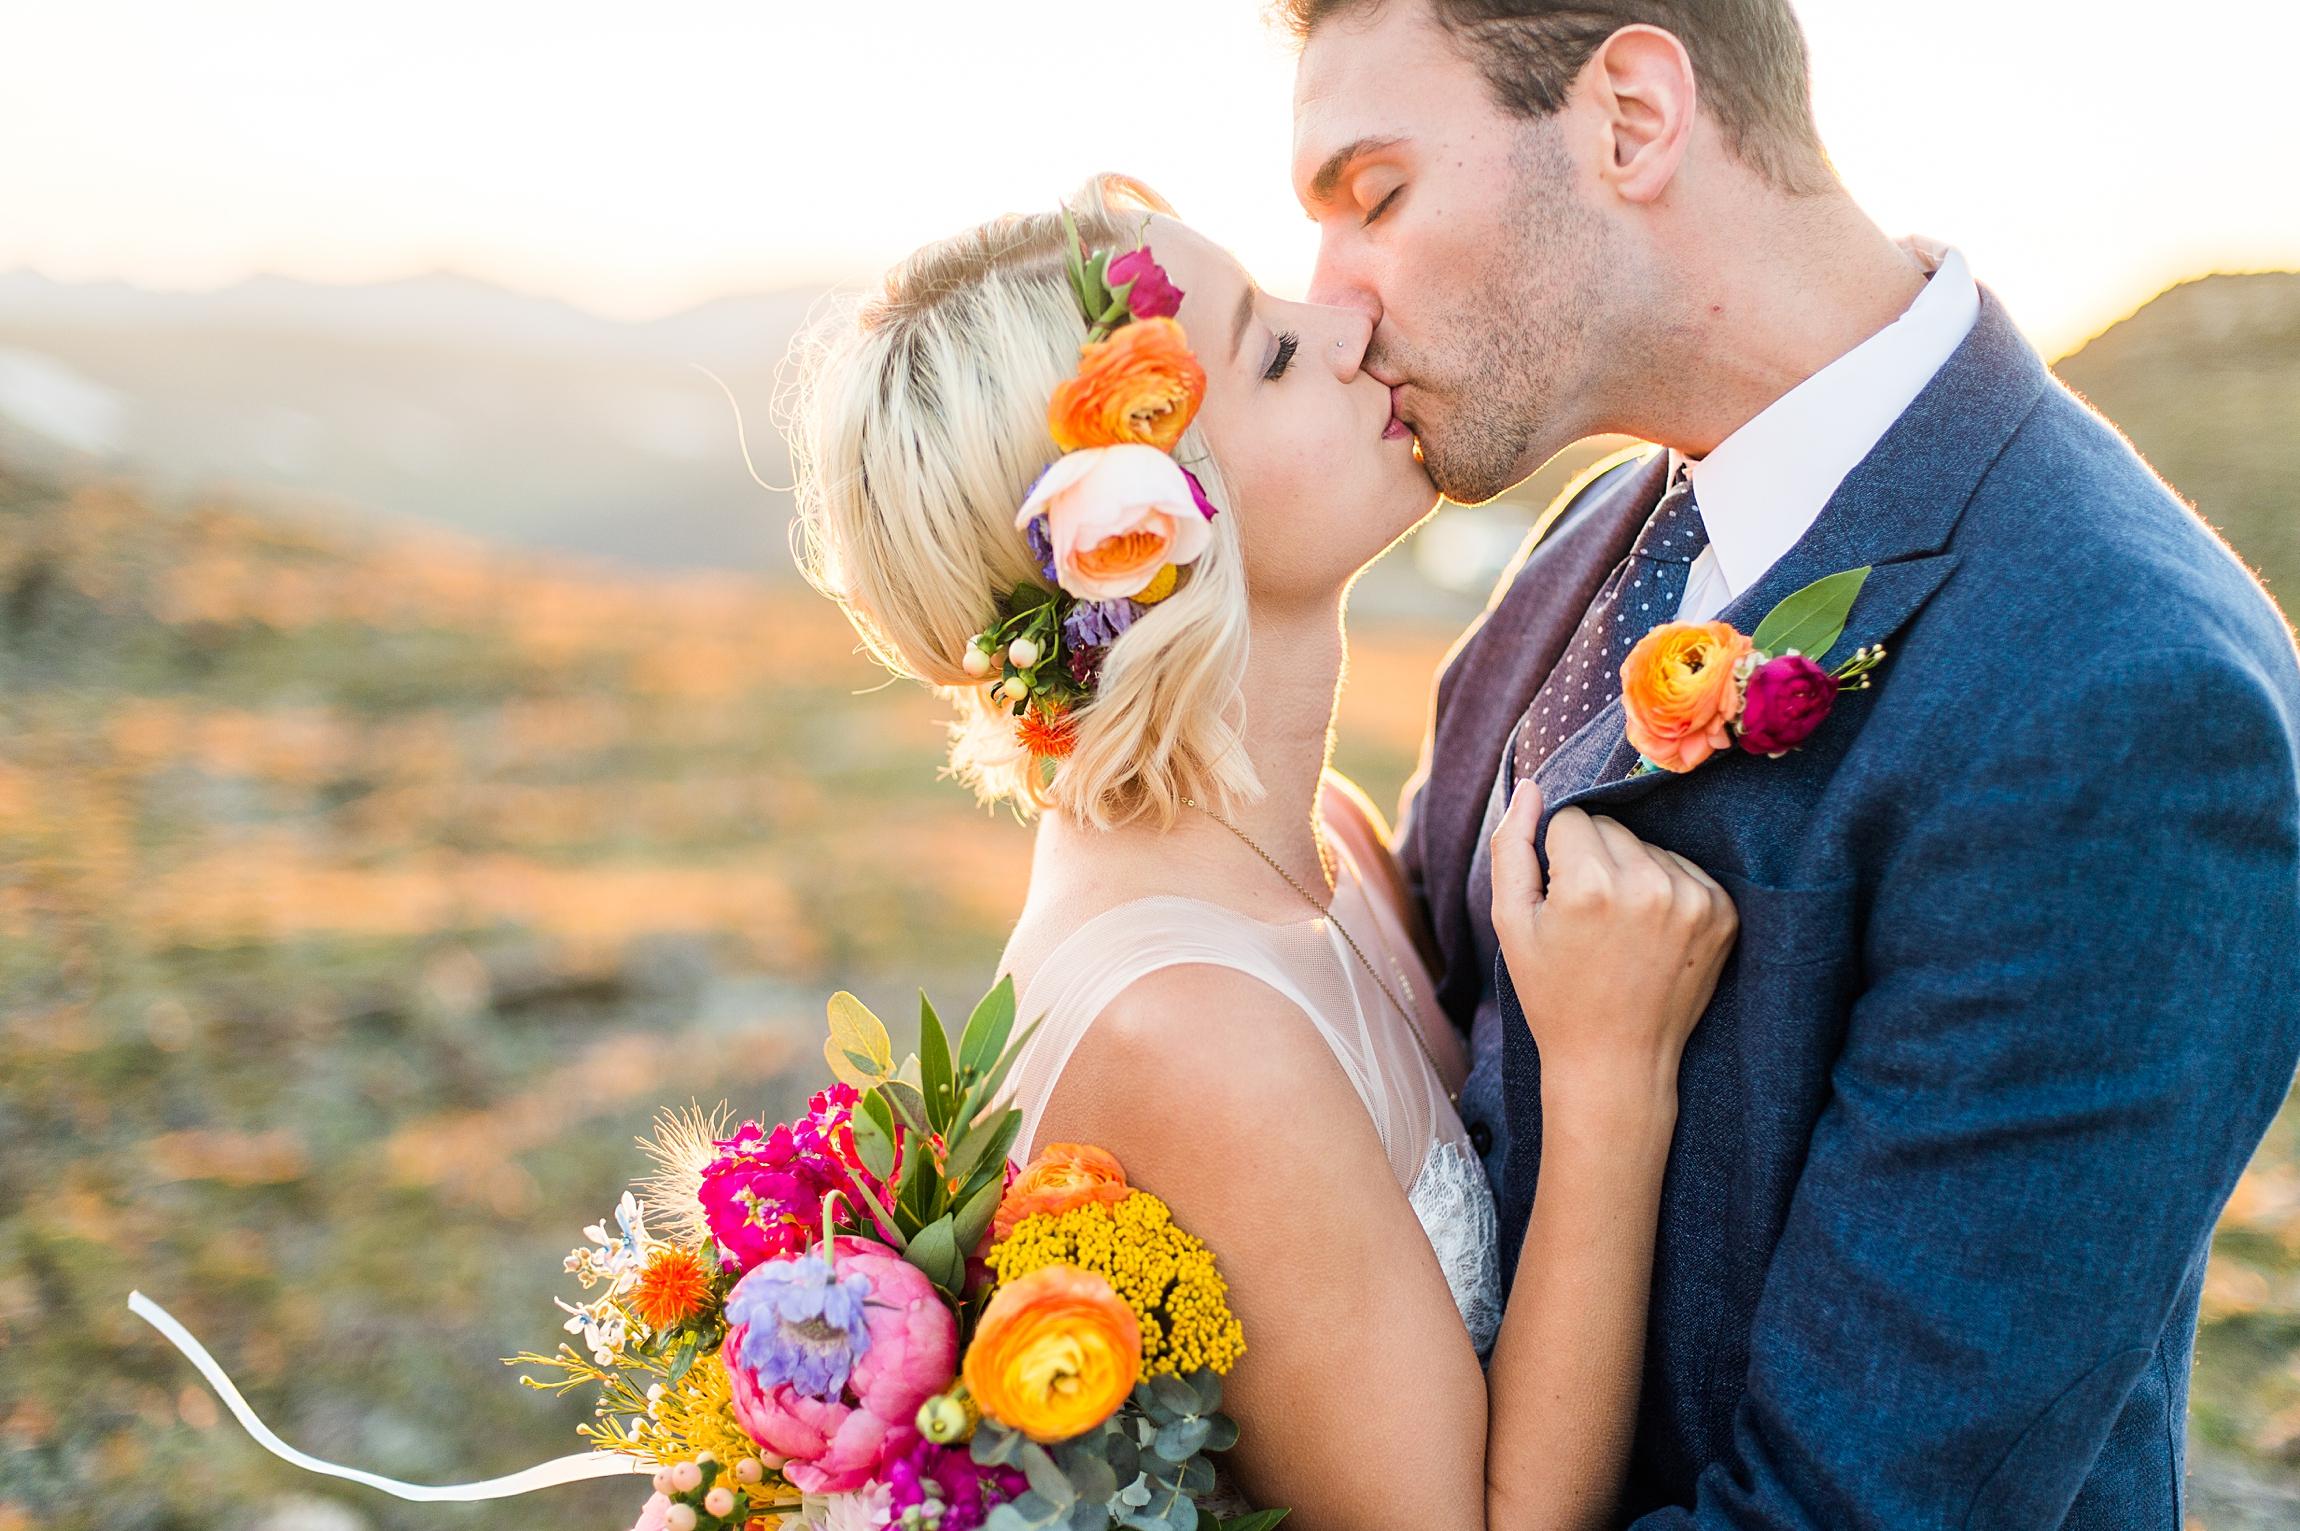 20160821-rocky-mountain-park-wedding_0018